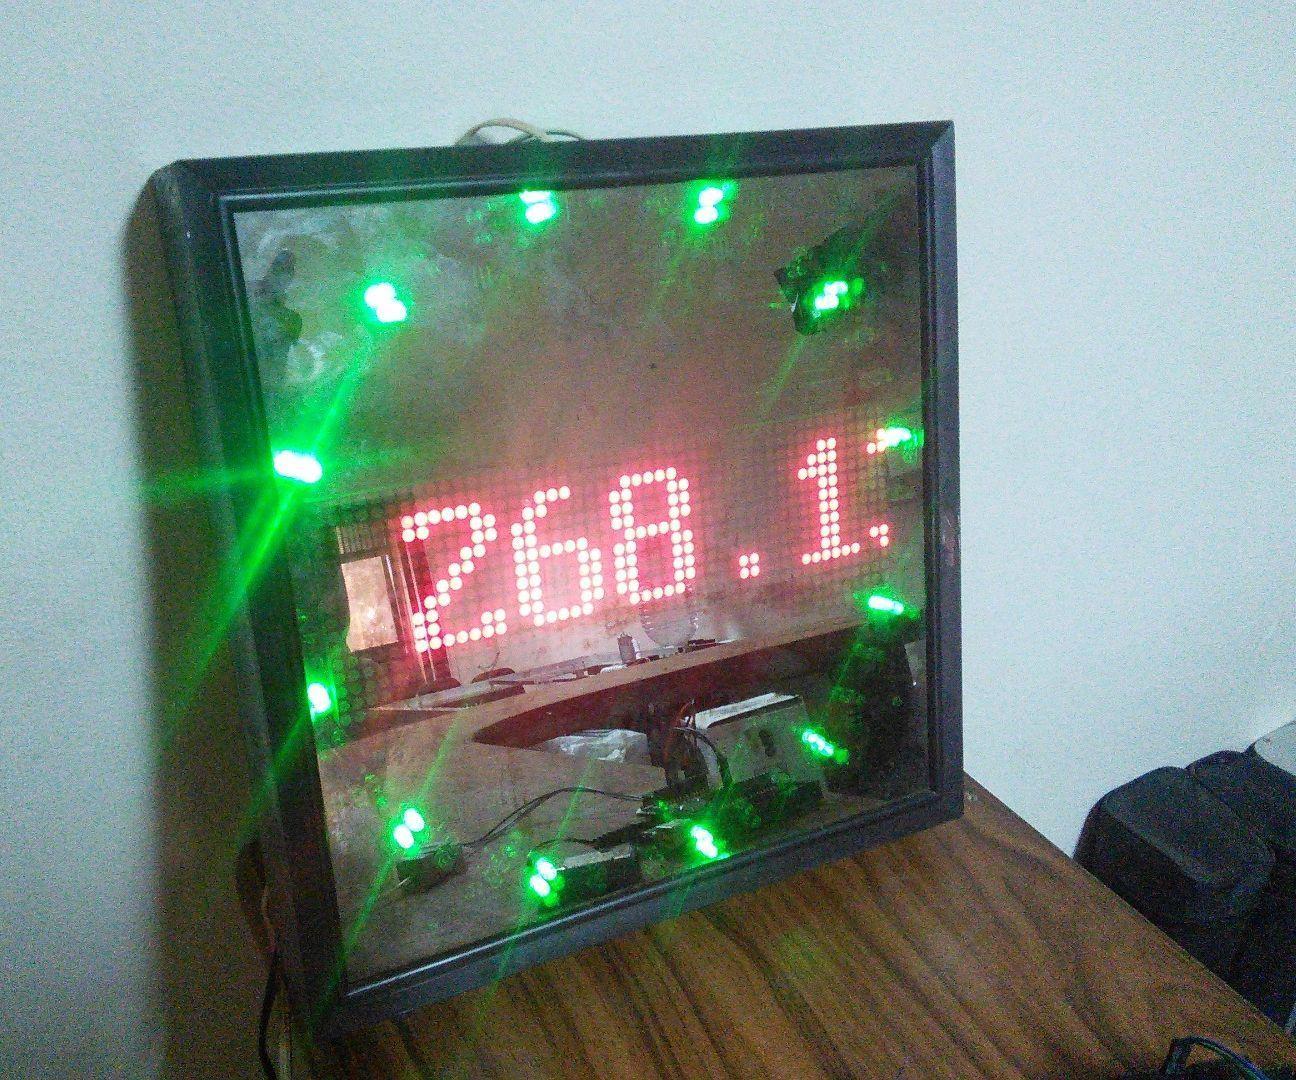 0xf0 bitcoins